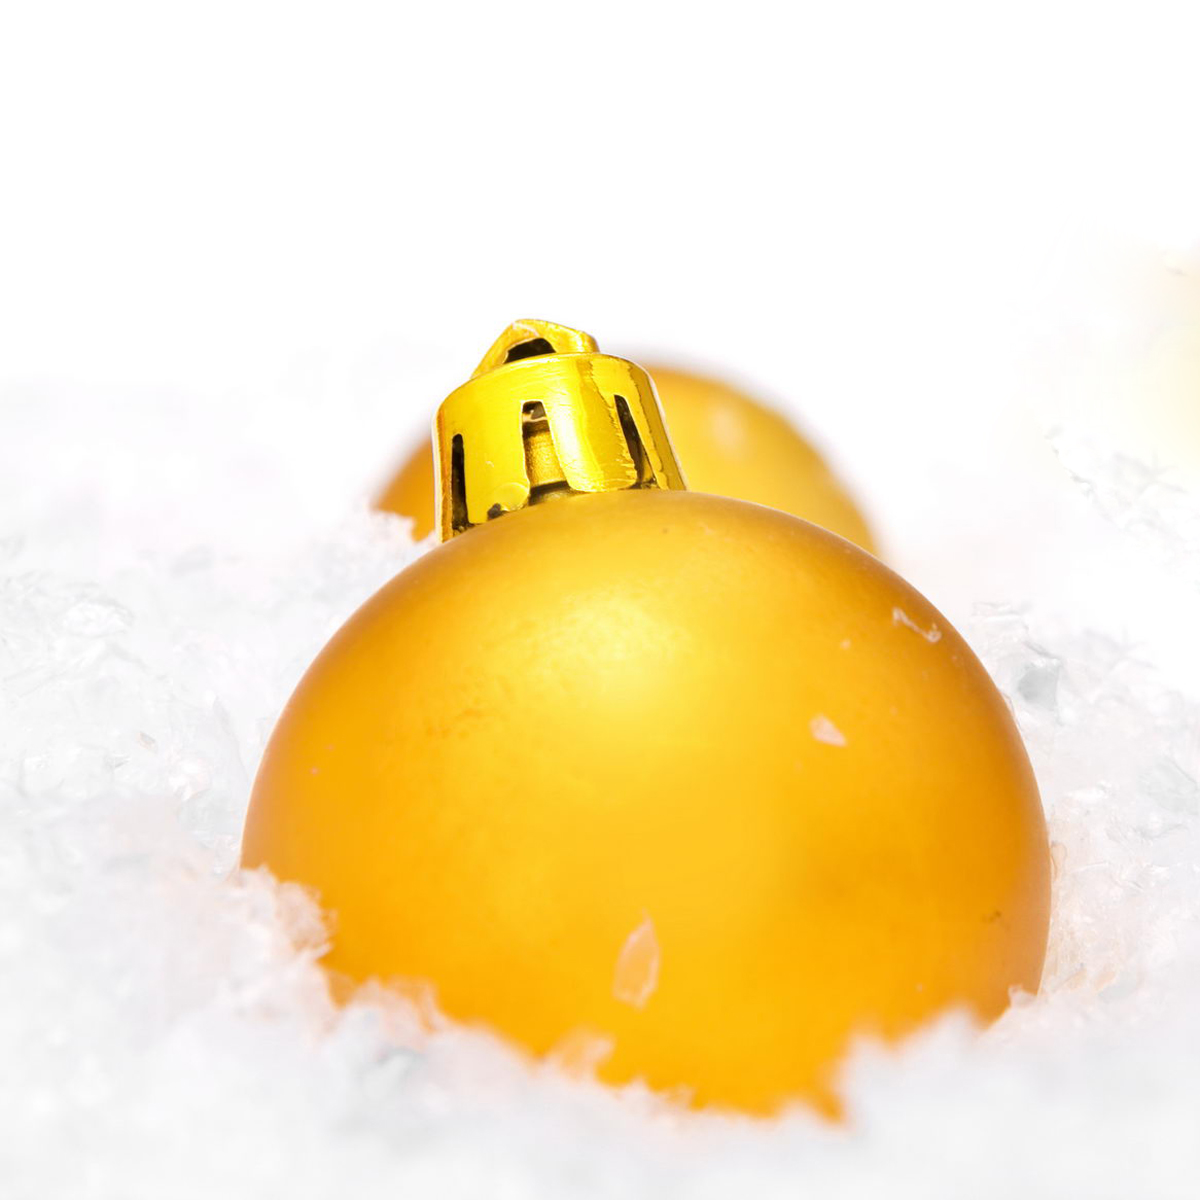 Christmas ball, Ball, Merry, Xmas, Winter, HQ Photo